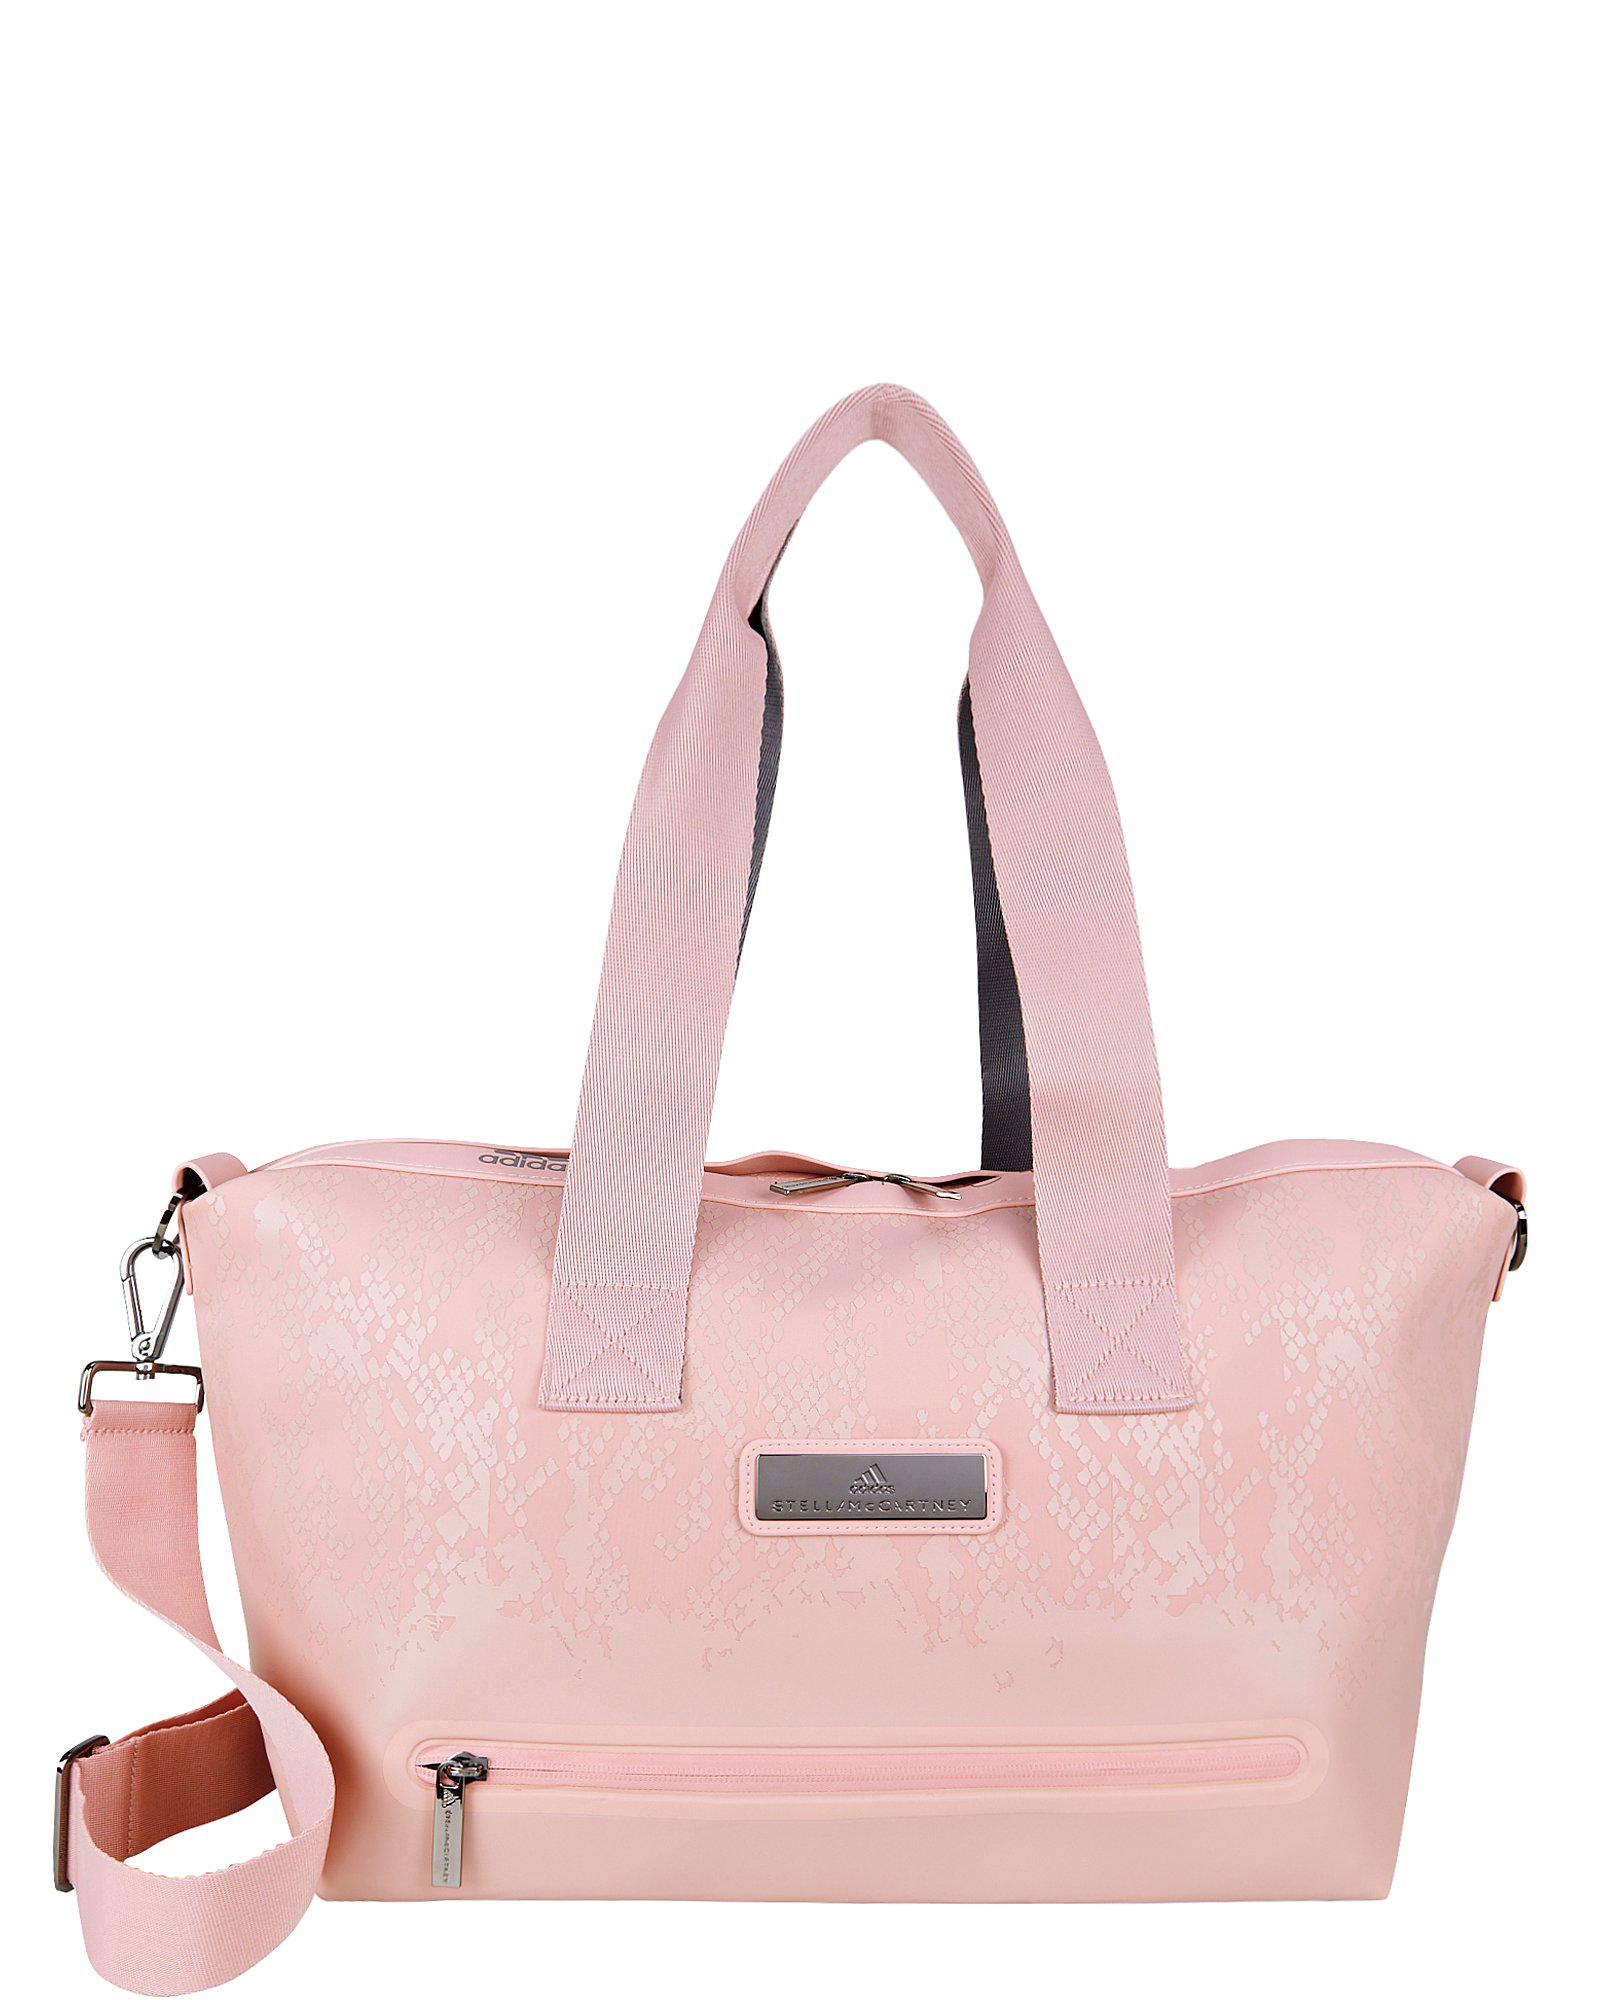 Adidas By Stella Mccartney Small Studio Pink Bag a4ca4e1497202